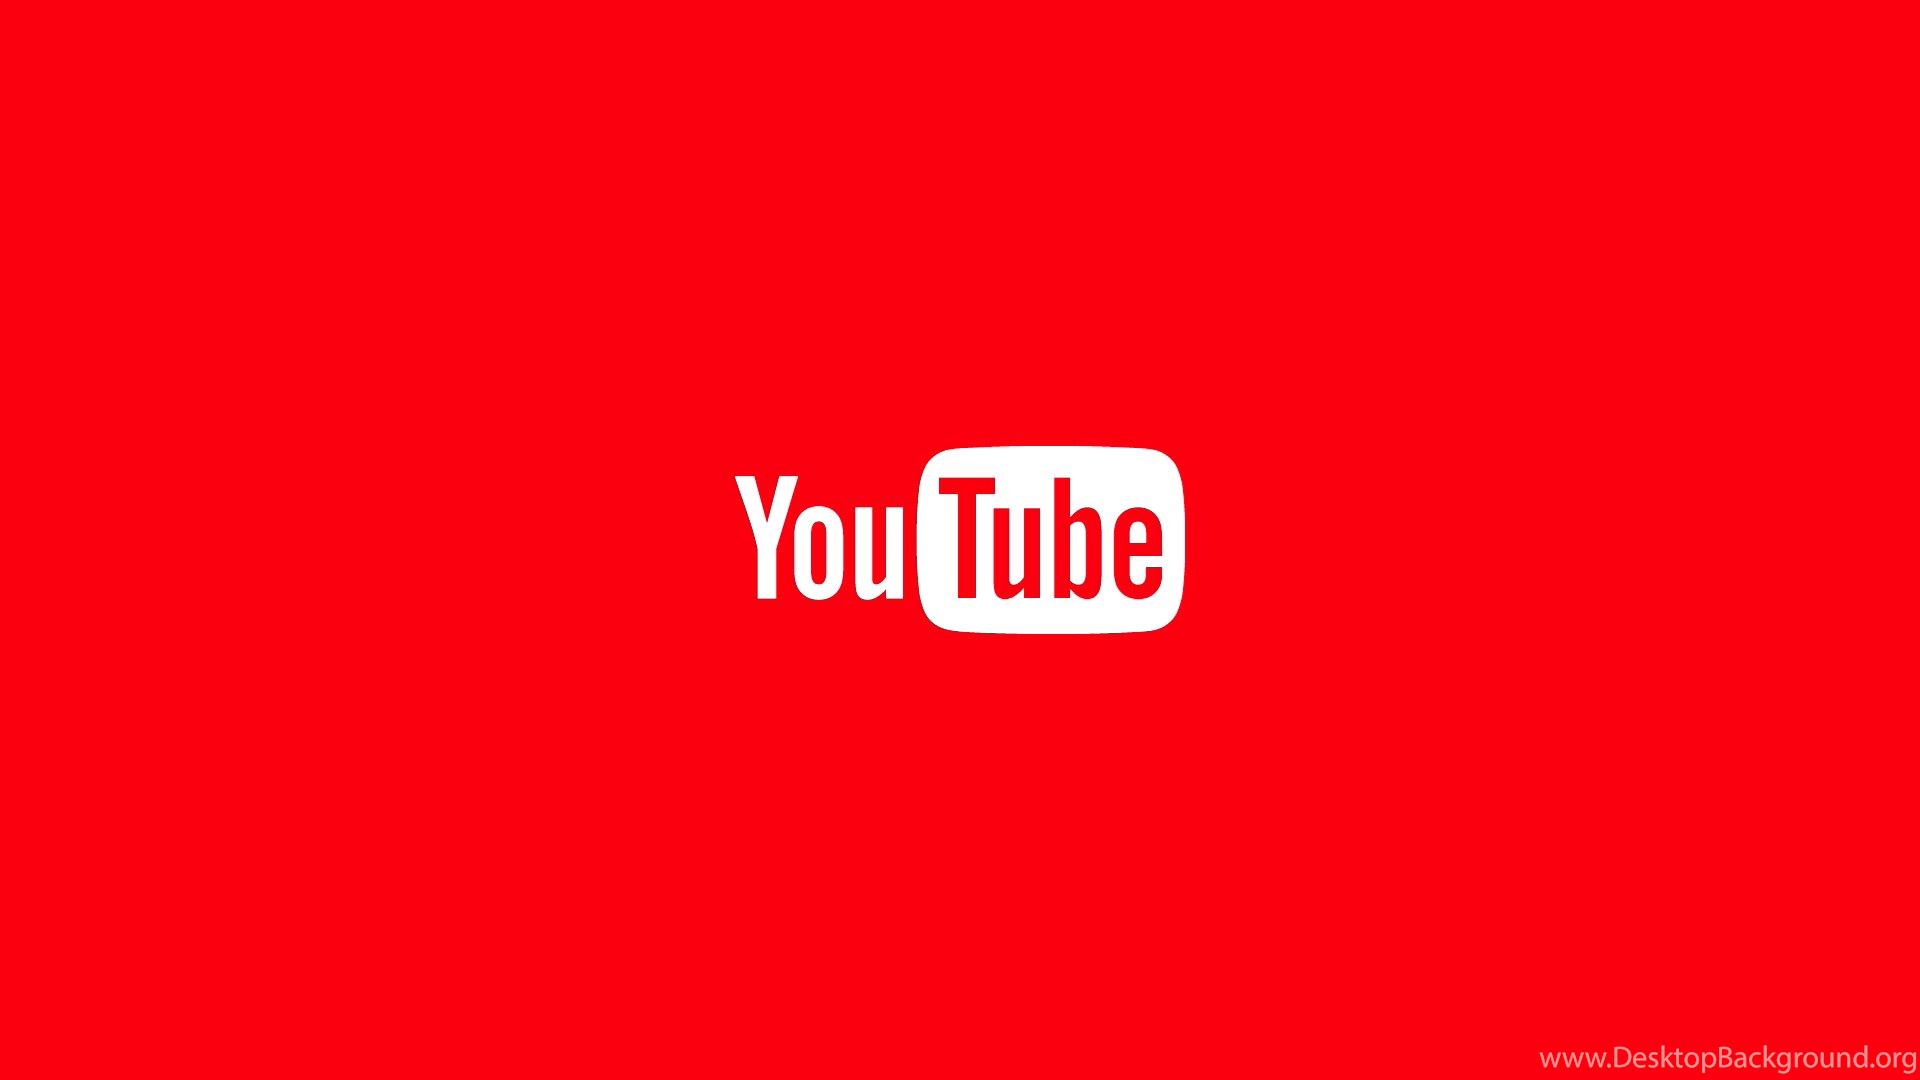 Youtube Logo HD Wallpaper 4 Desktop Background